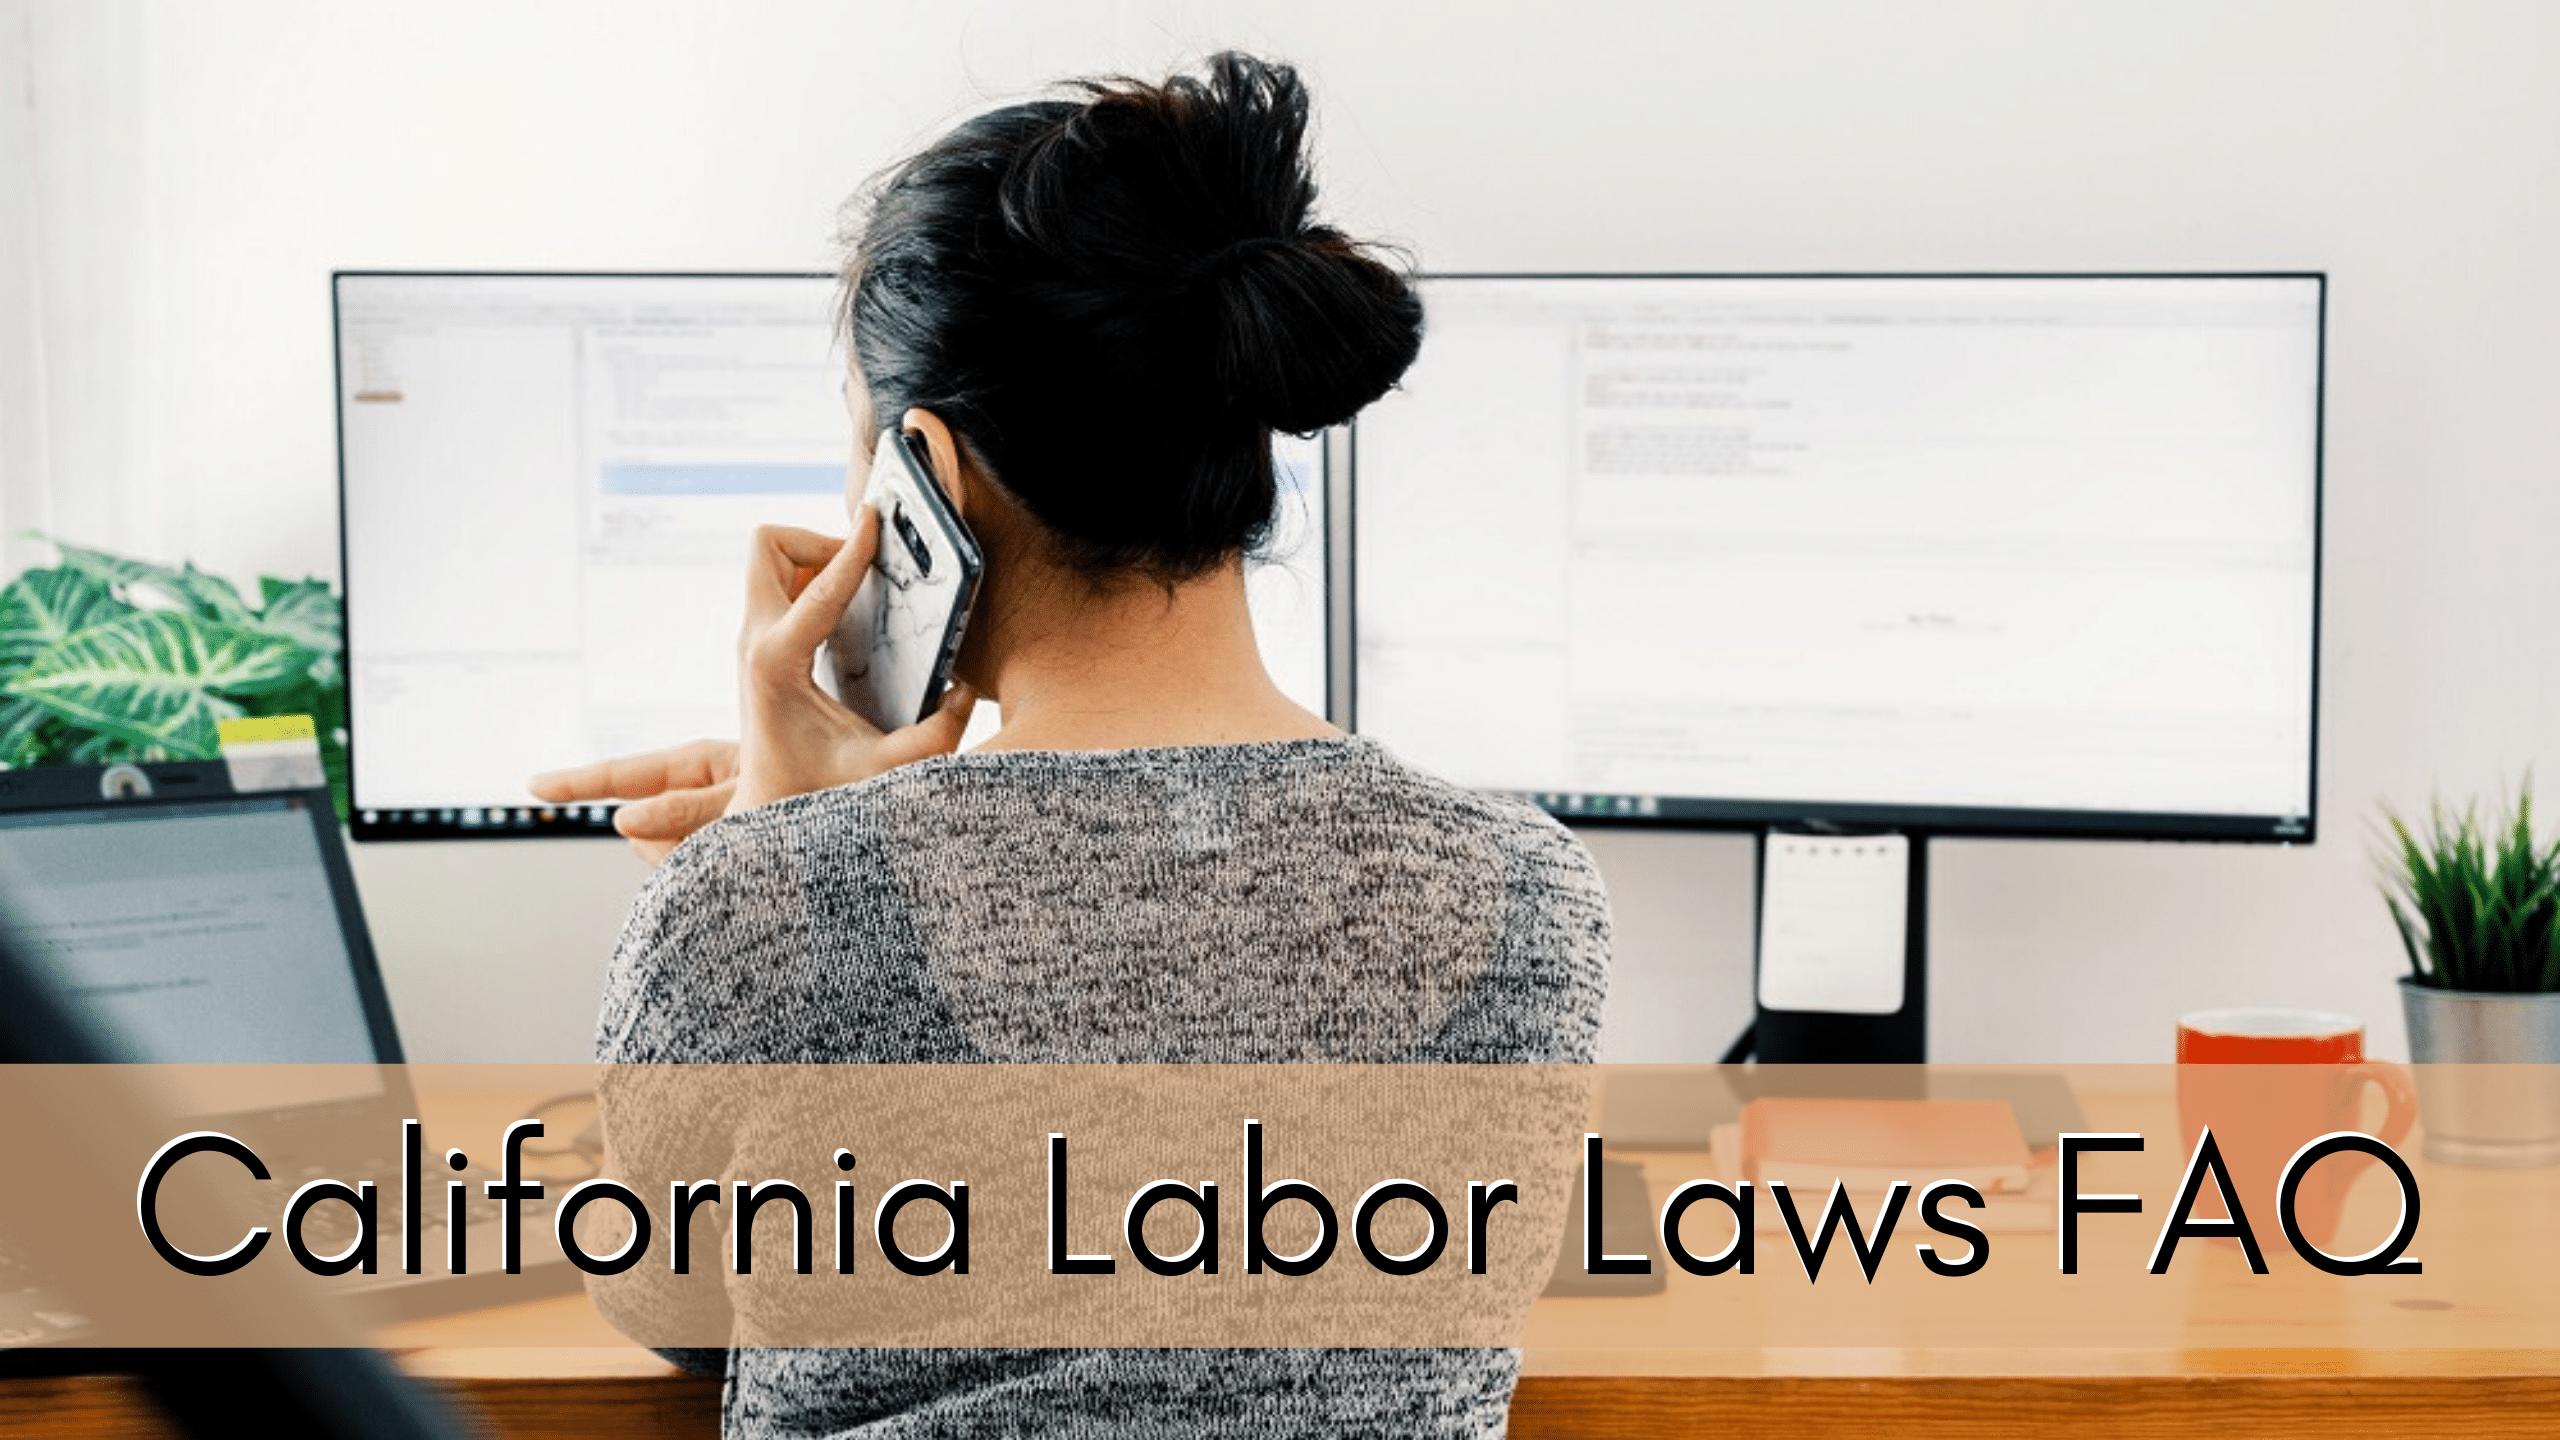 California Labor Laws FAQ